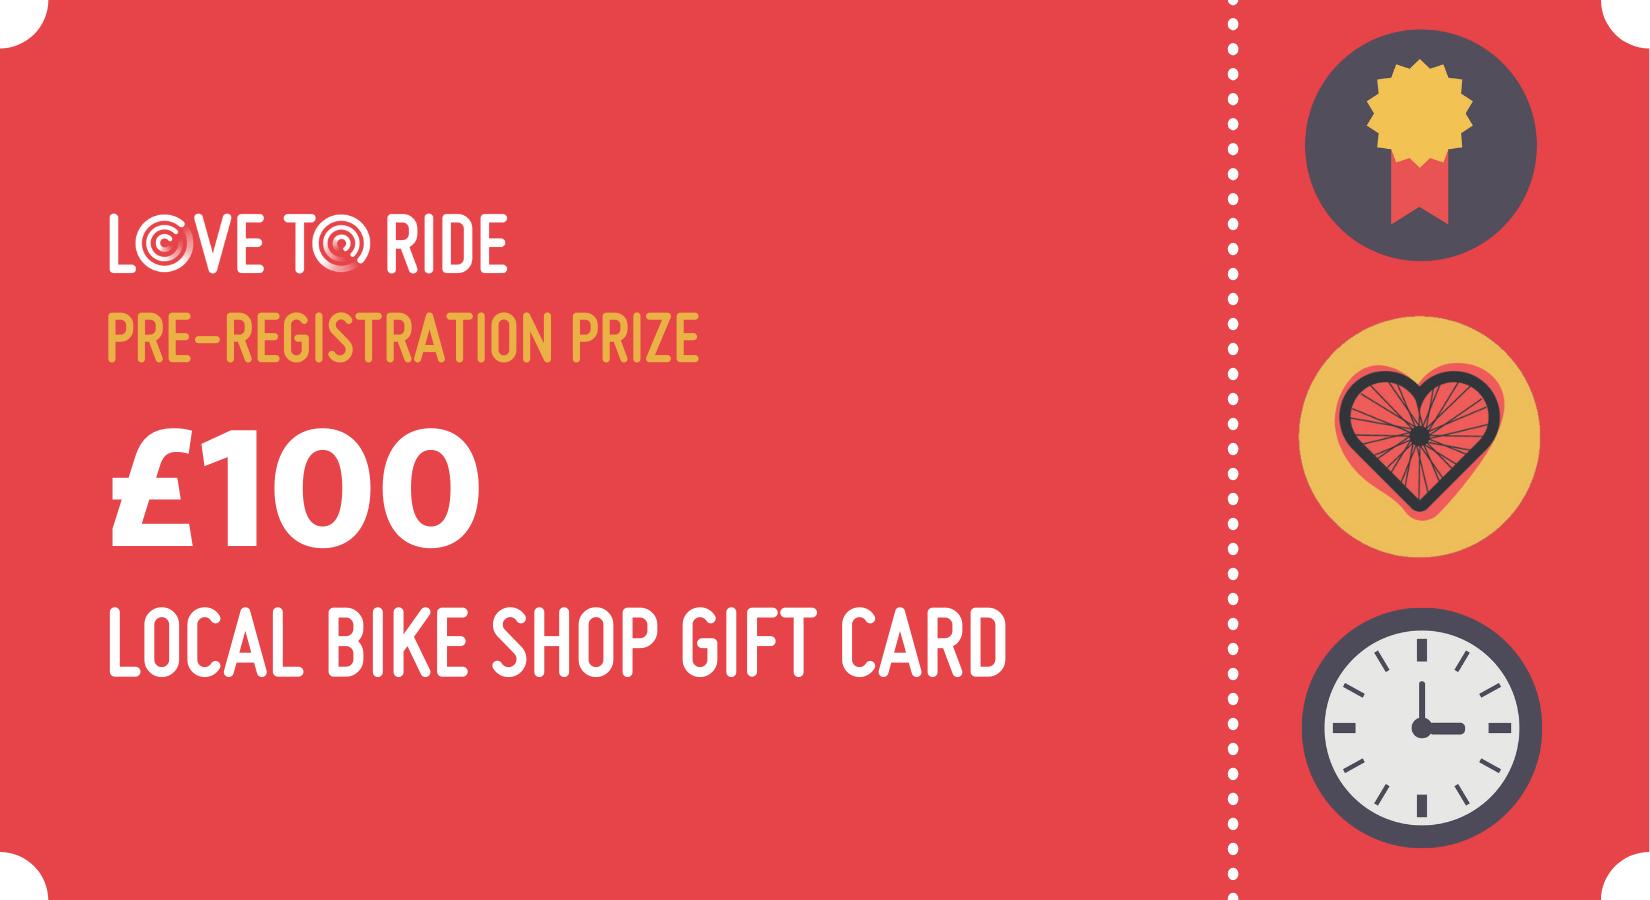 £100 prize voucher